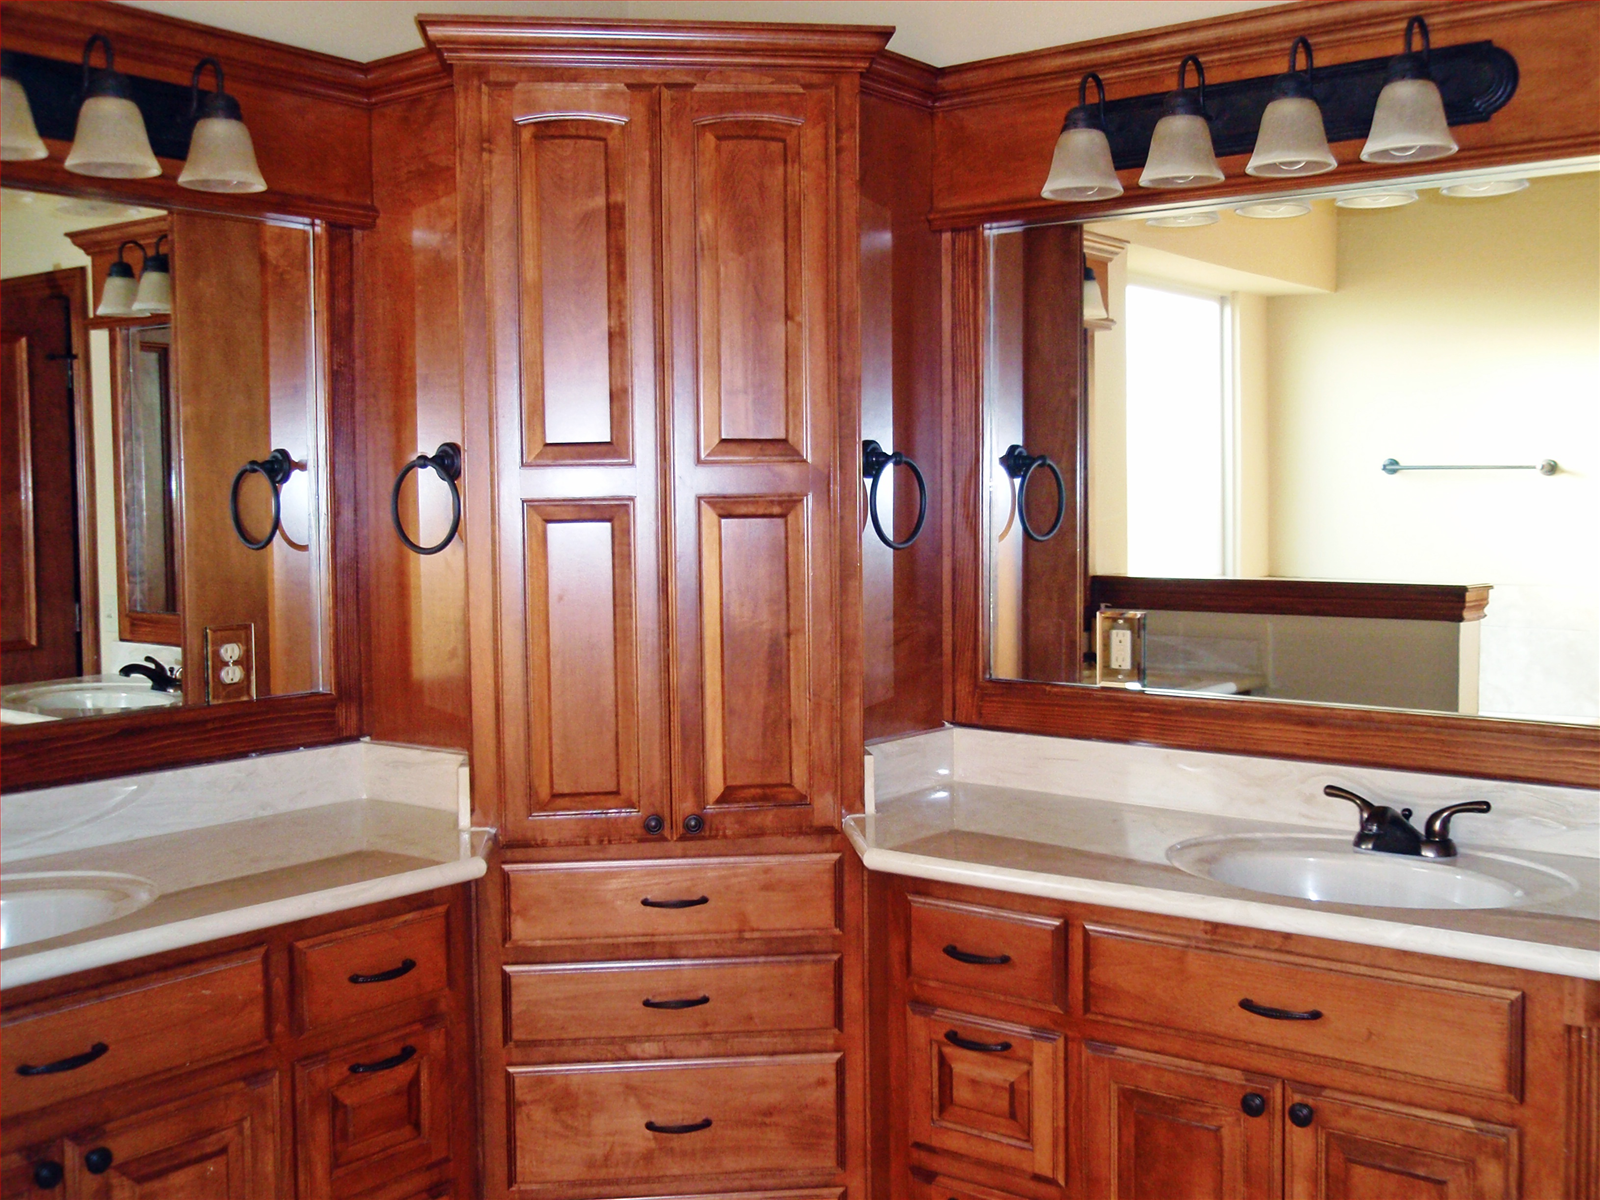 Master Bath double corner vanity; do not like the